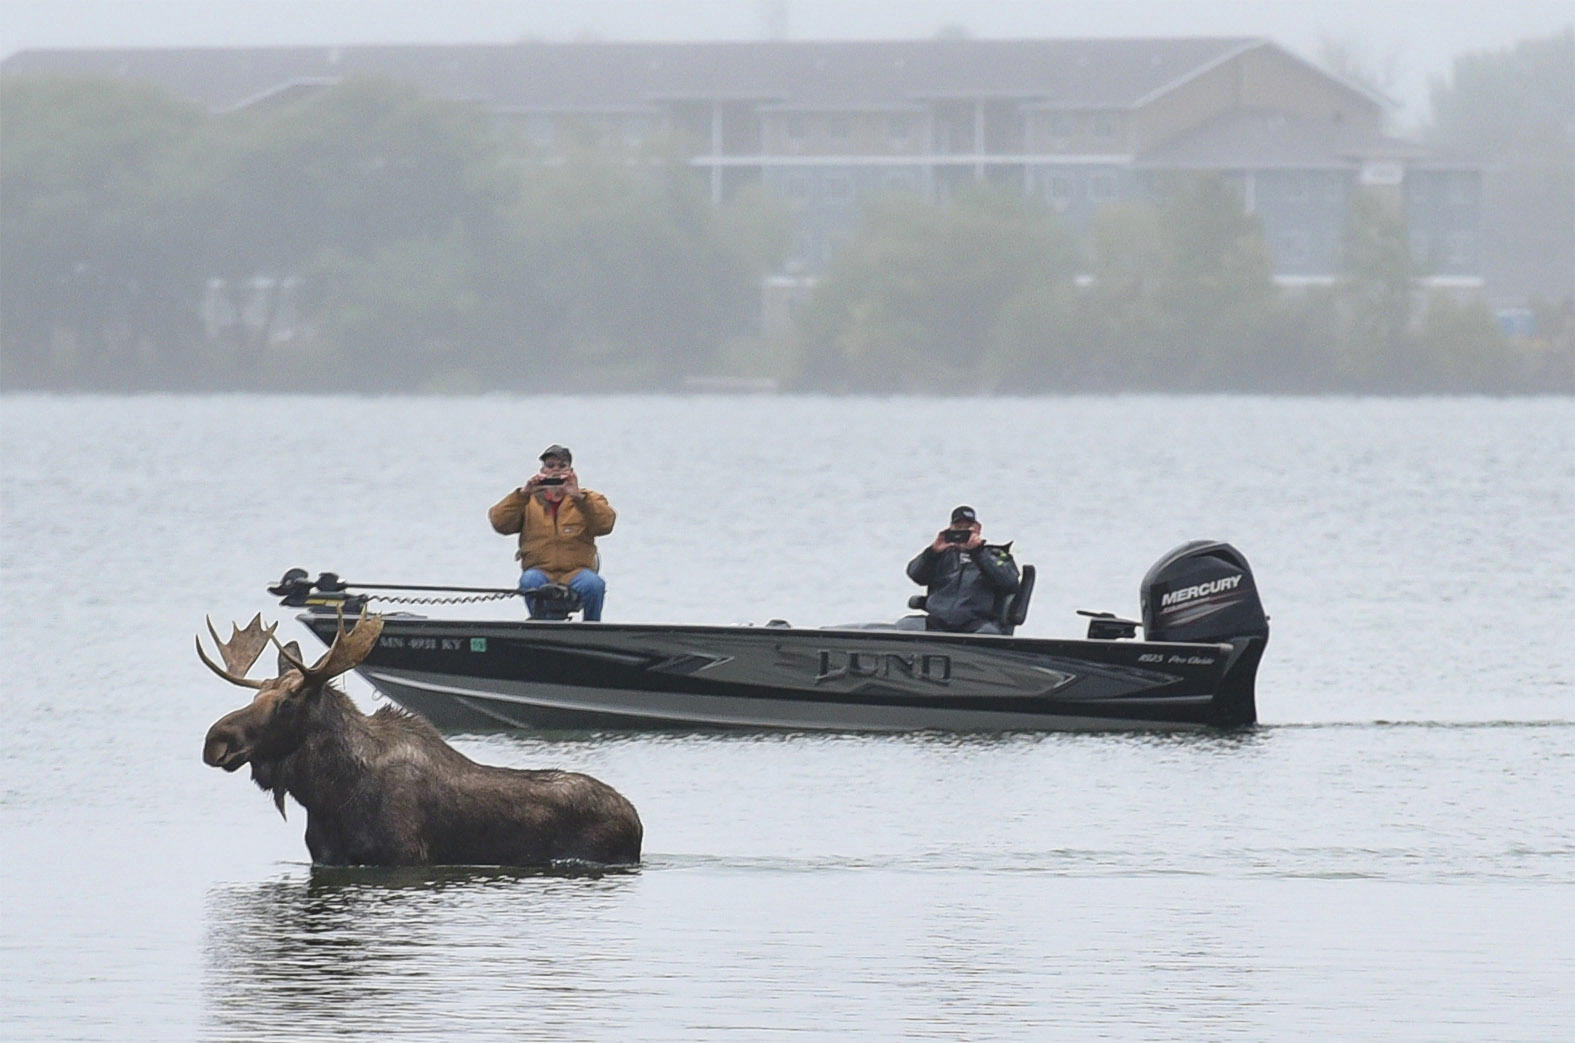 A moose visited Lake Bemidji in September 2017.